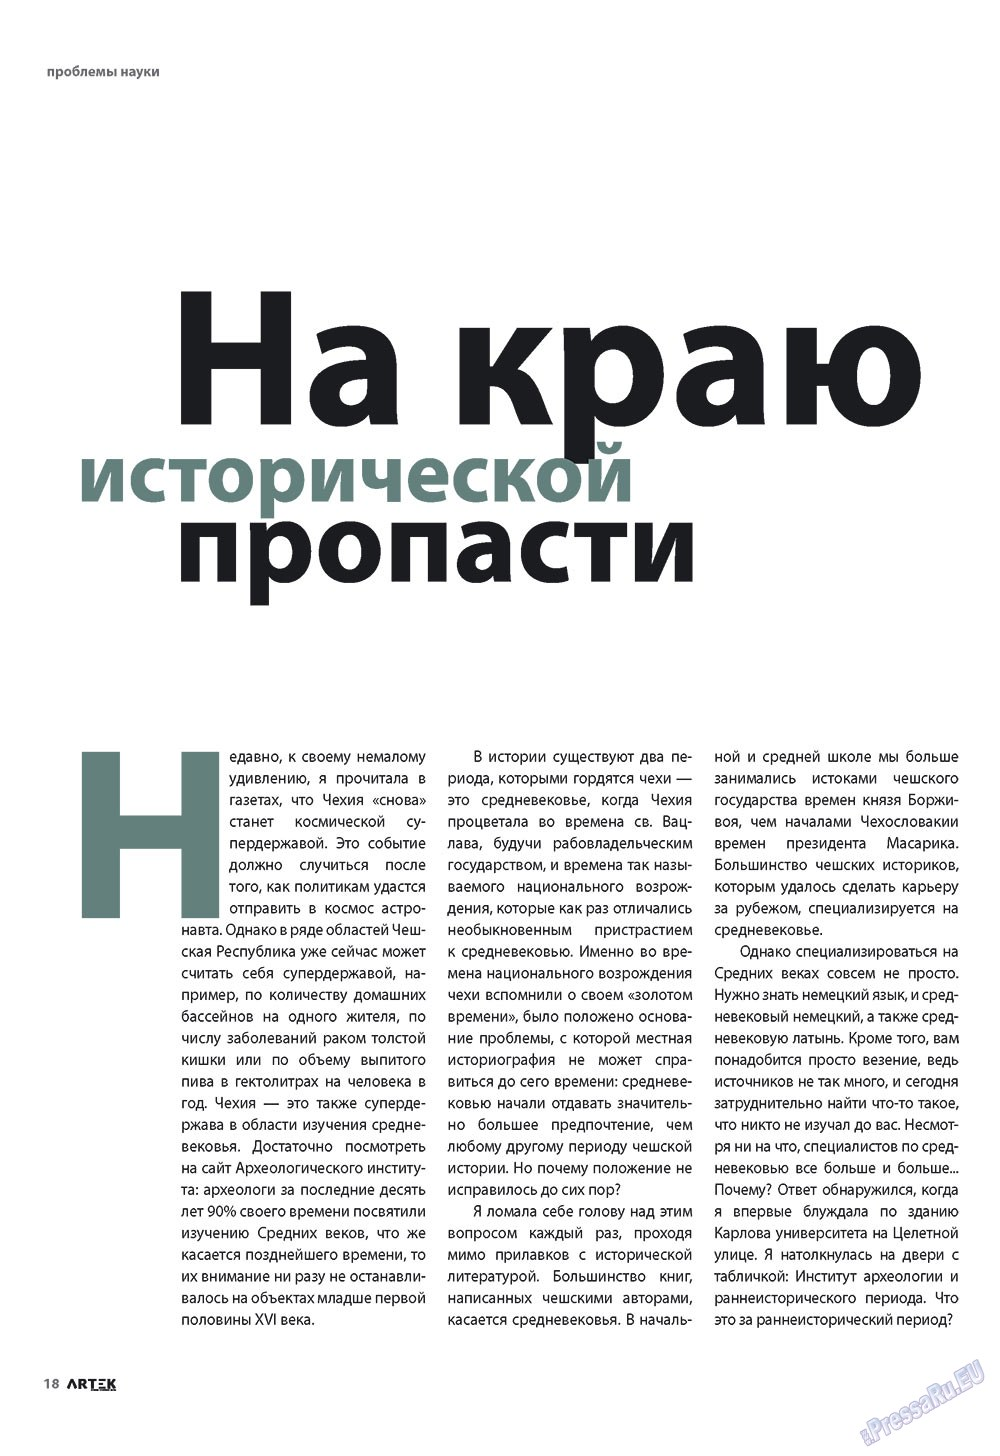 Артек (журнал). 2009 год, номер 6, стр. 20